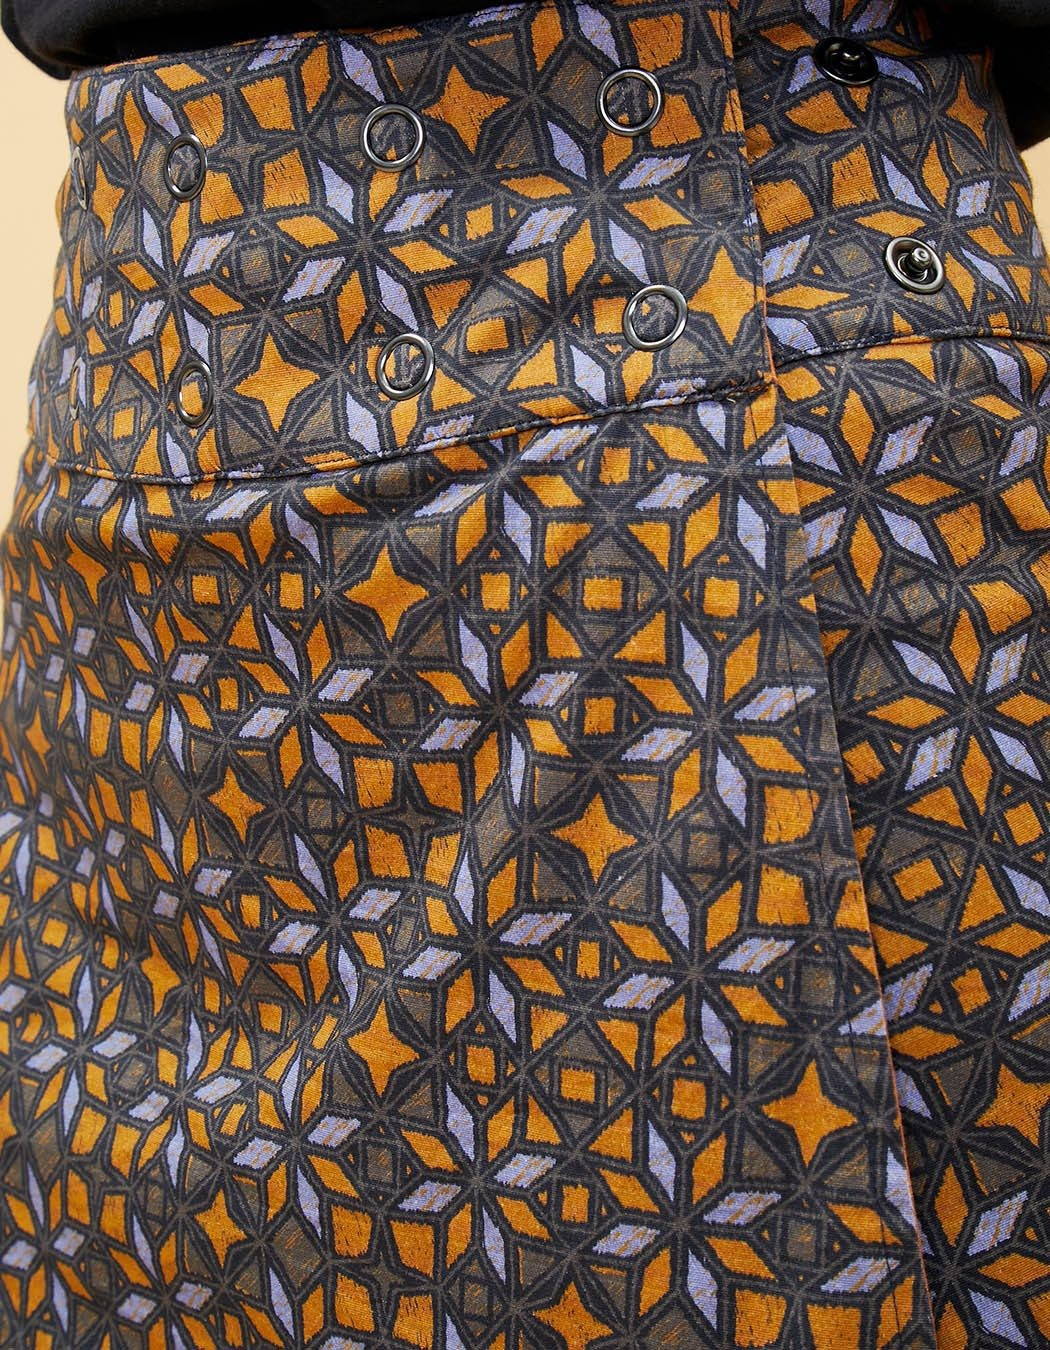 Jupe réversible La Fiancée du Mékong, Mataran imprimée ou camel